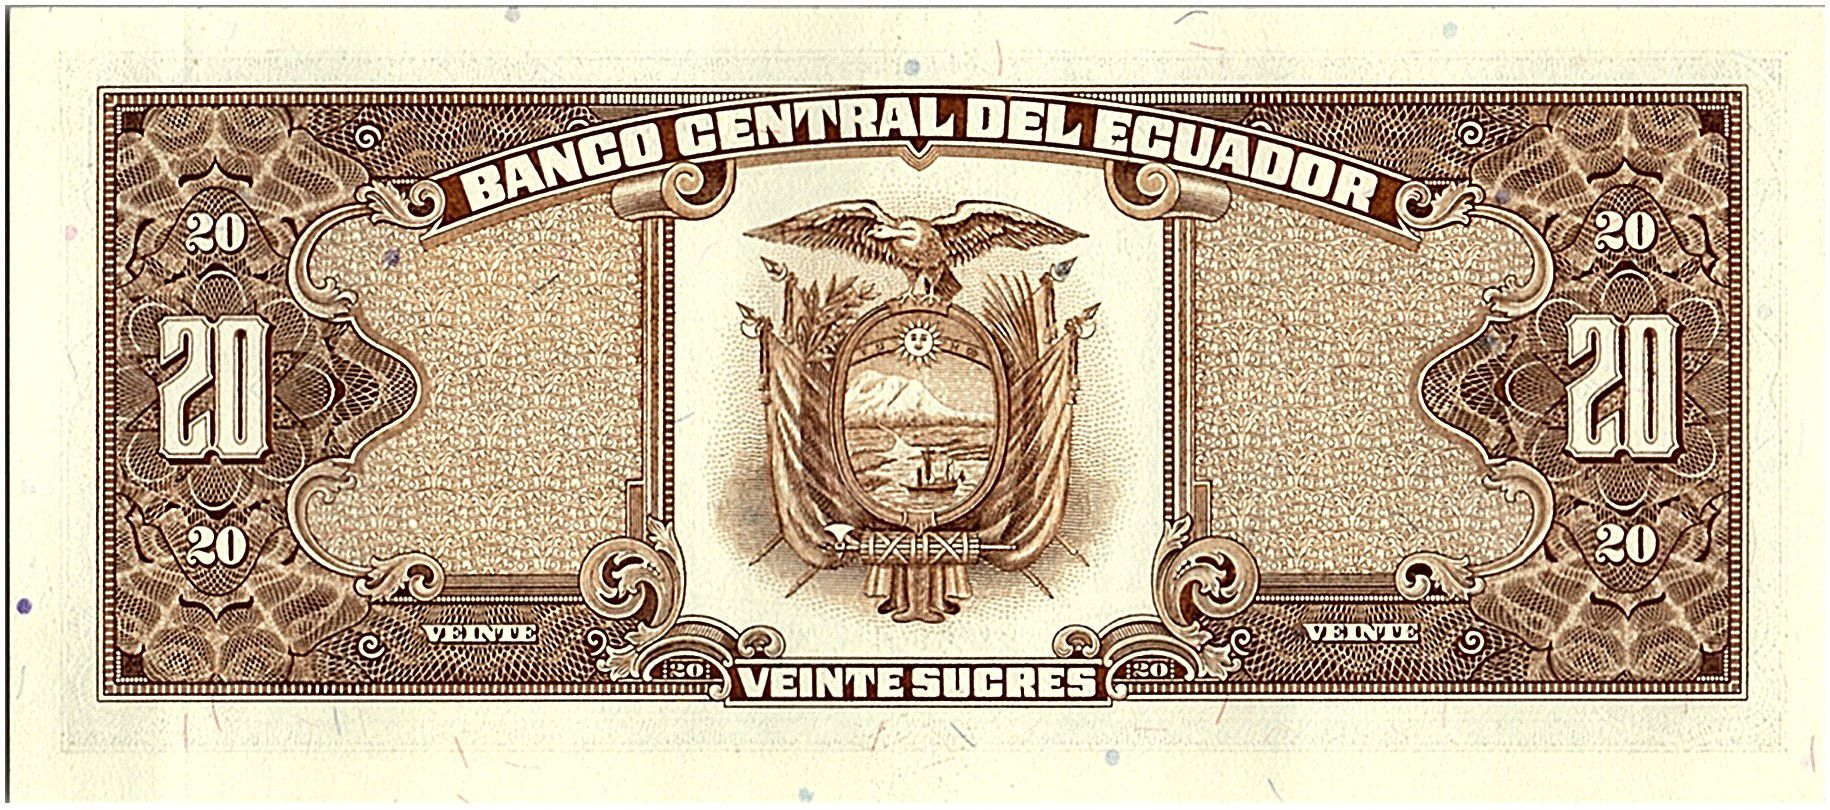 Equateur 20 Sucres  - Eglise, armoiries - 1988